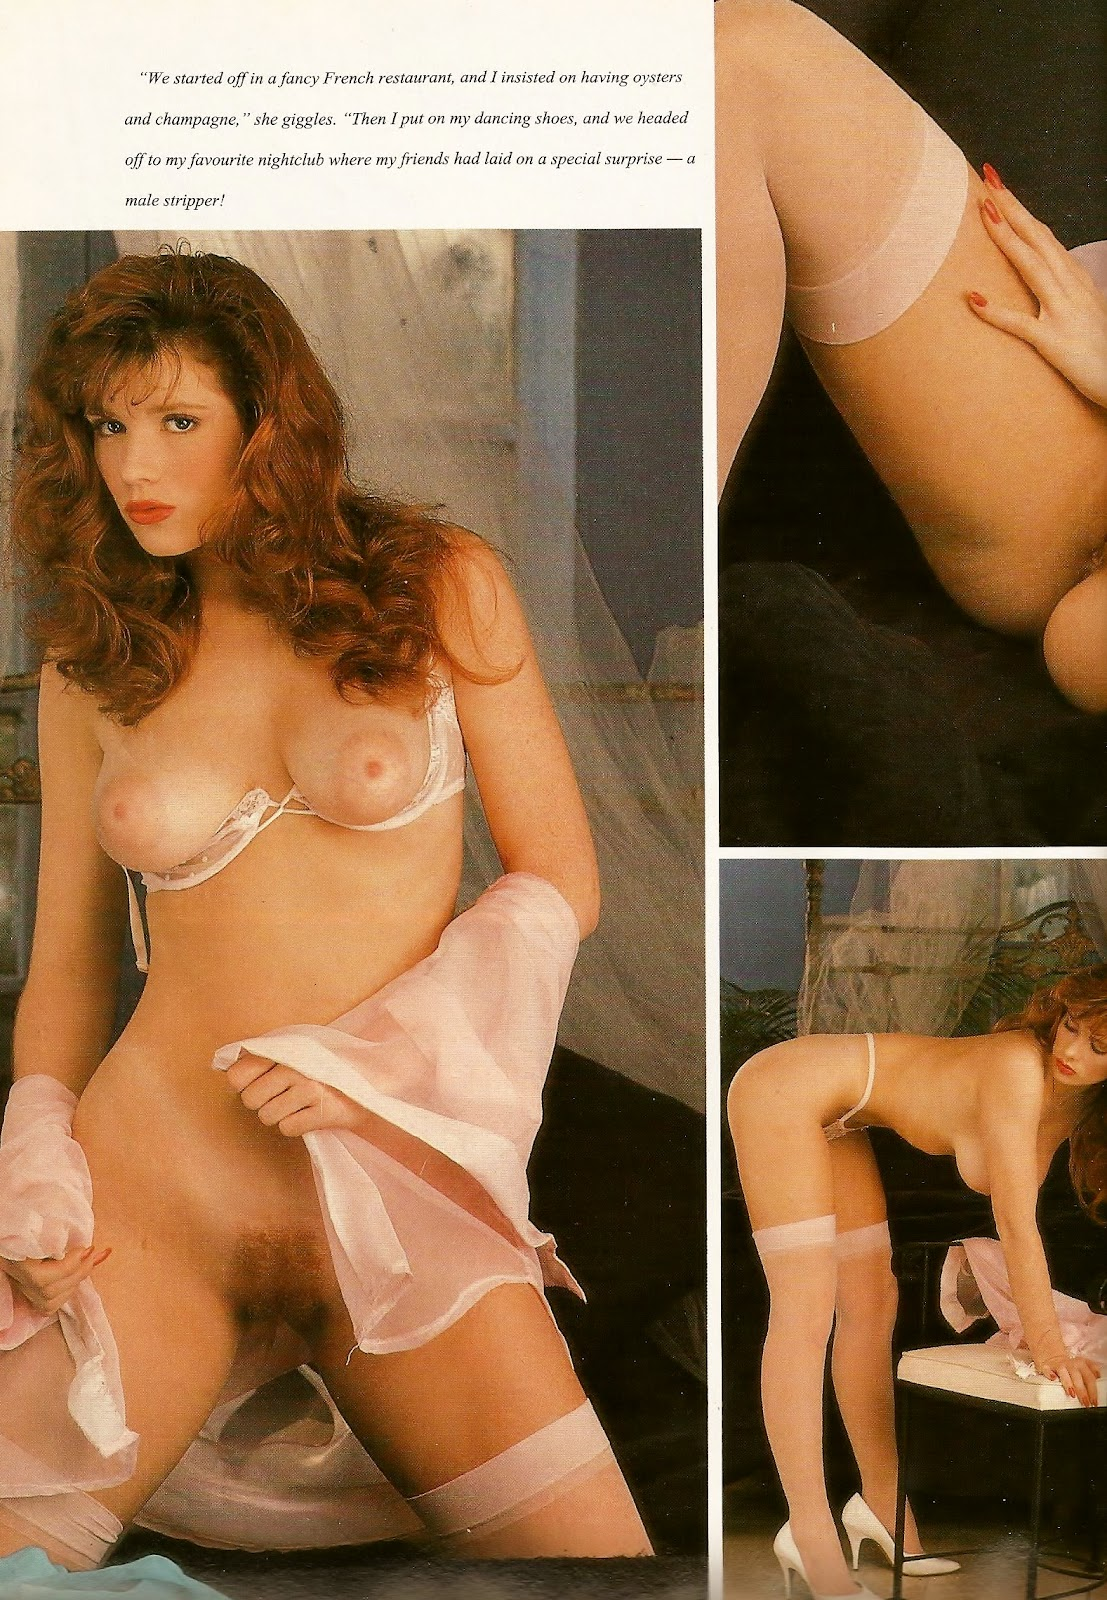 International club magazine nude can not